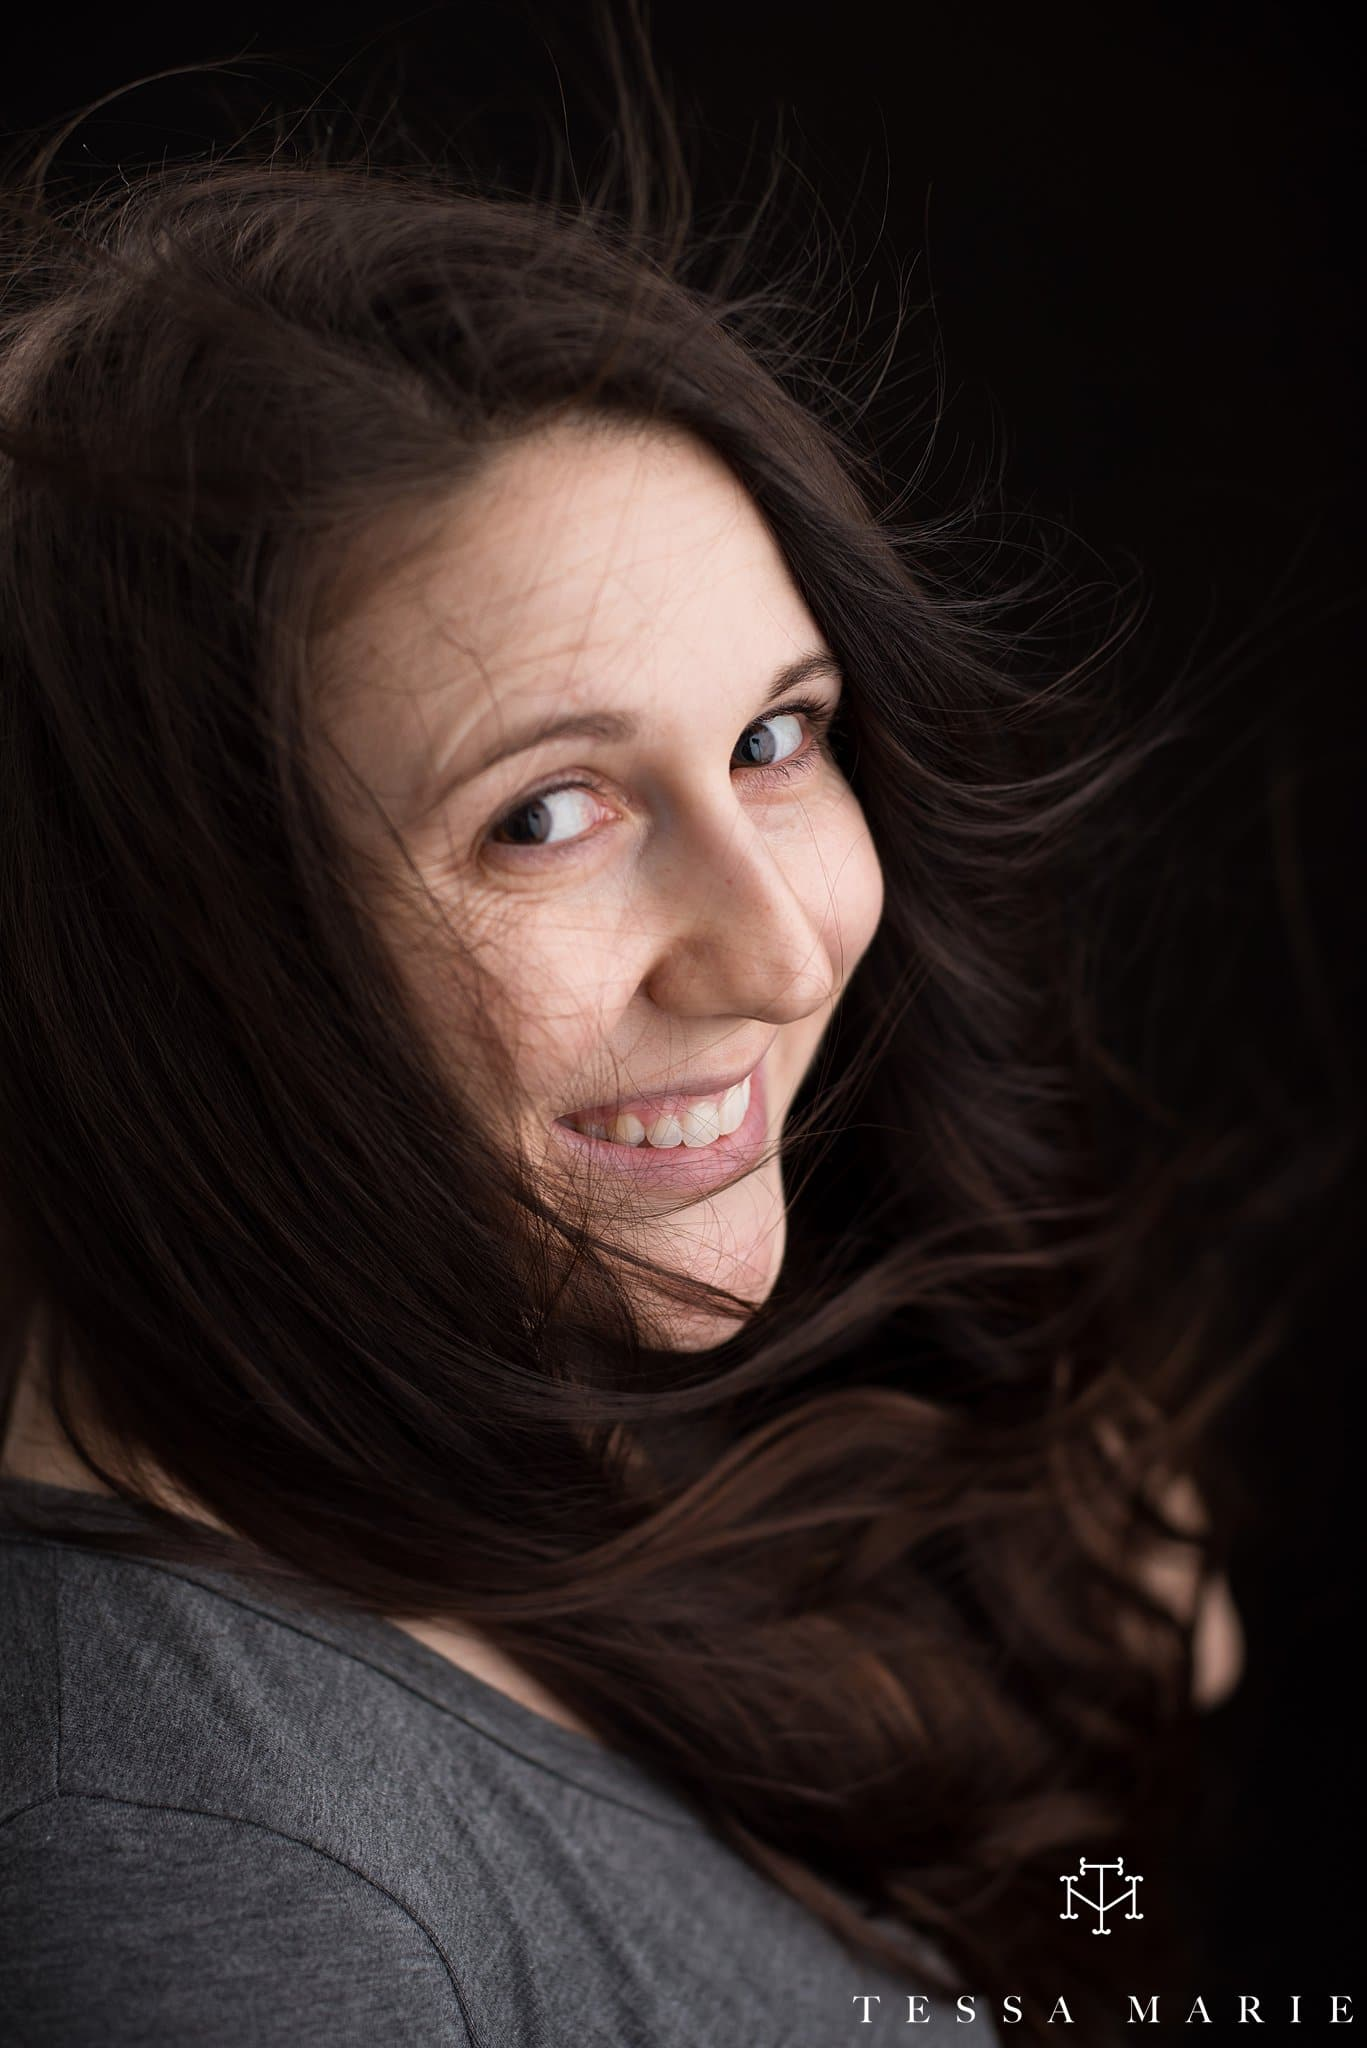 makeup_free_womens_portraits_tessa_marie_studios_no_makeup_empowering_women_0008.jpg